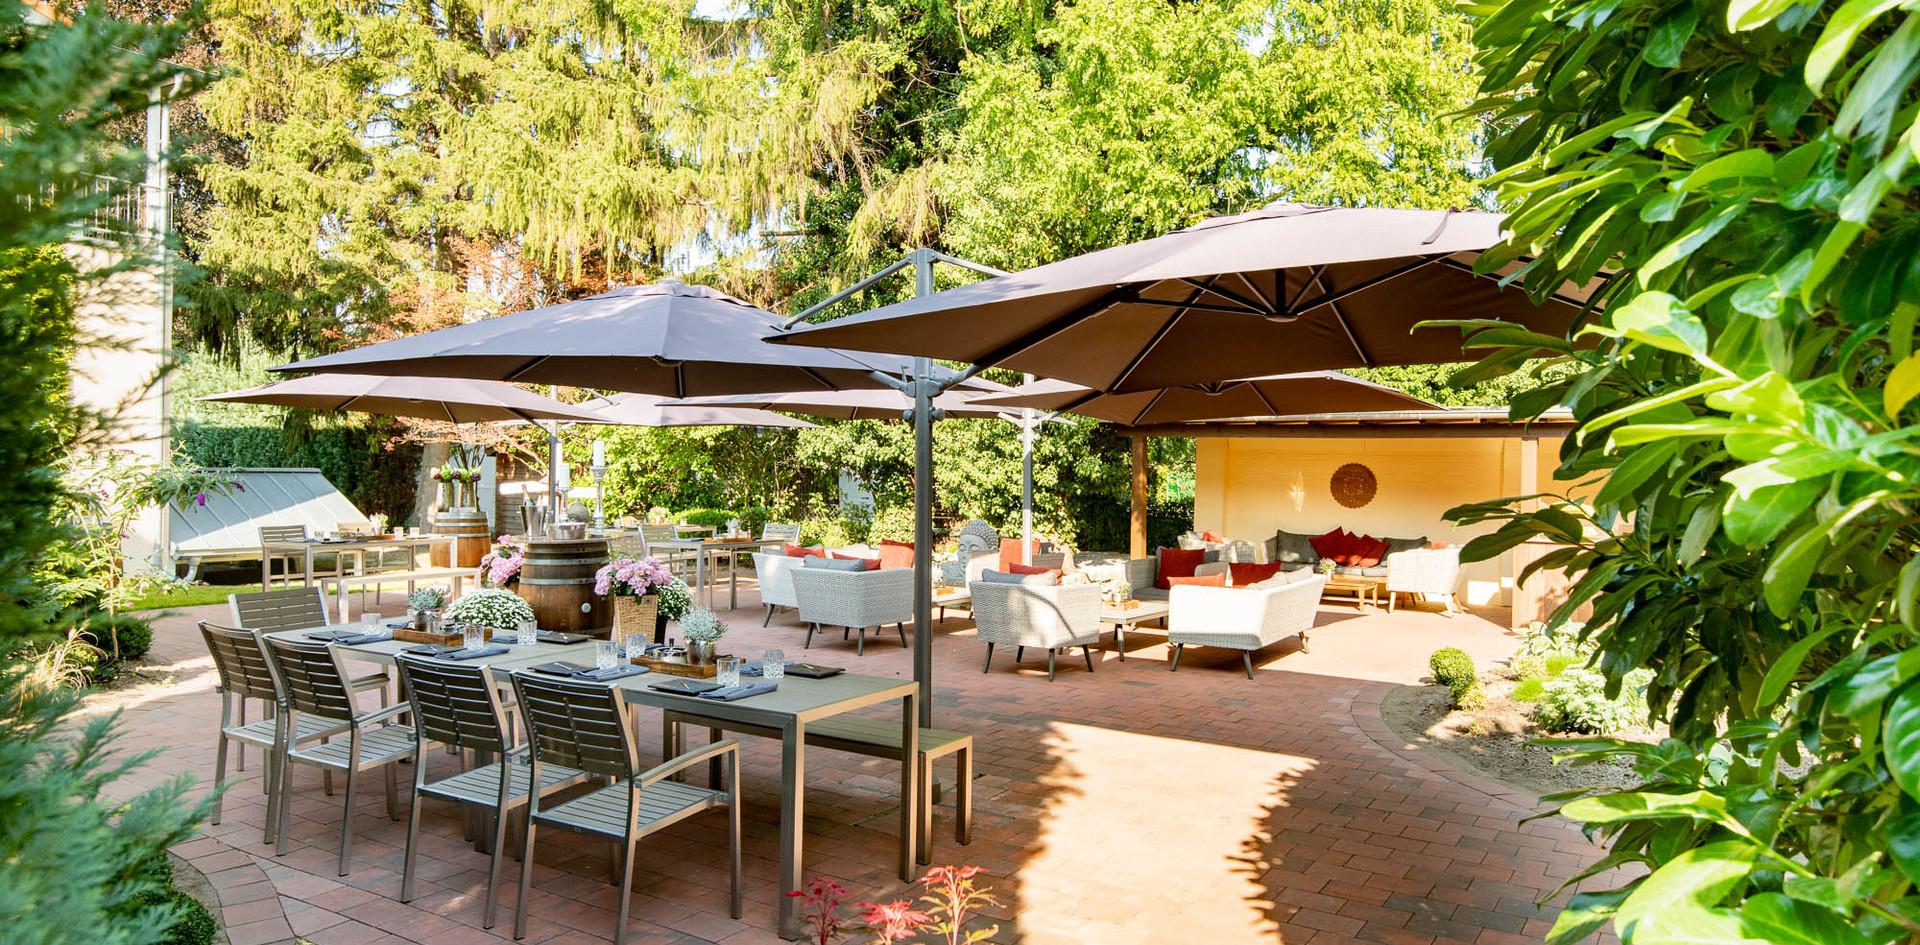 Gartenterrasse Eingang Hotel Wegner - the culinary art hotel